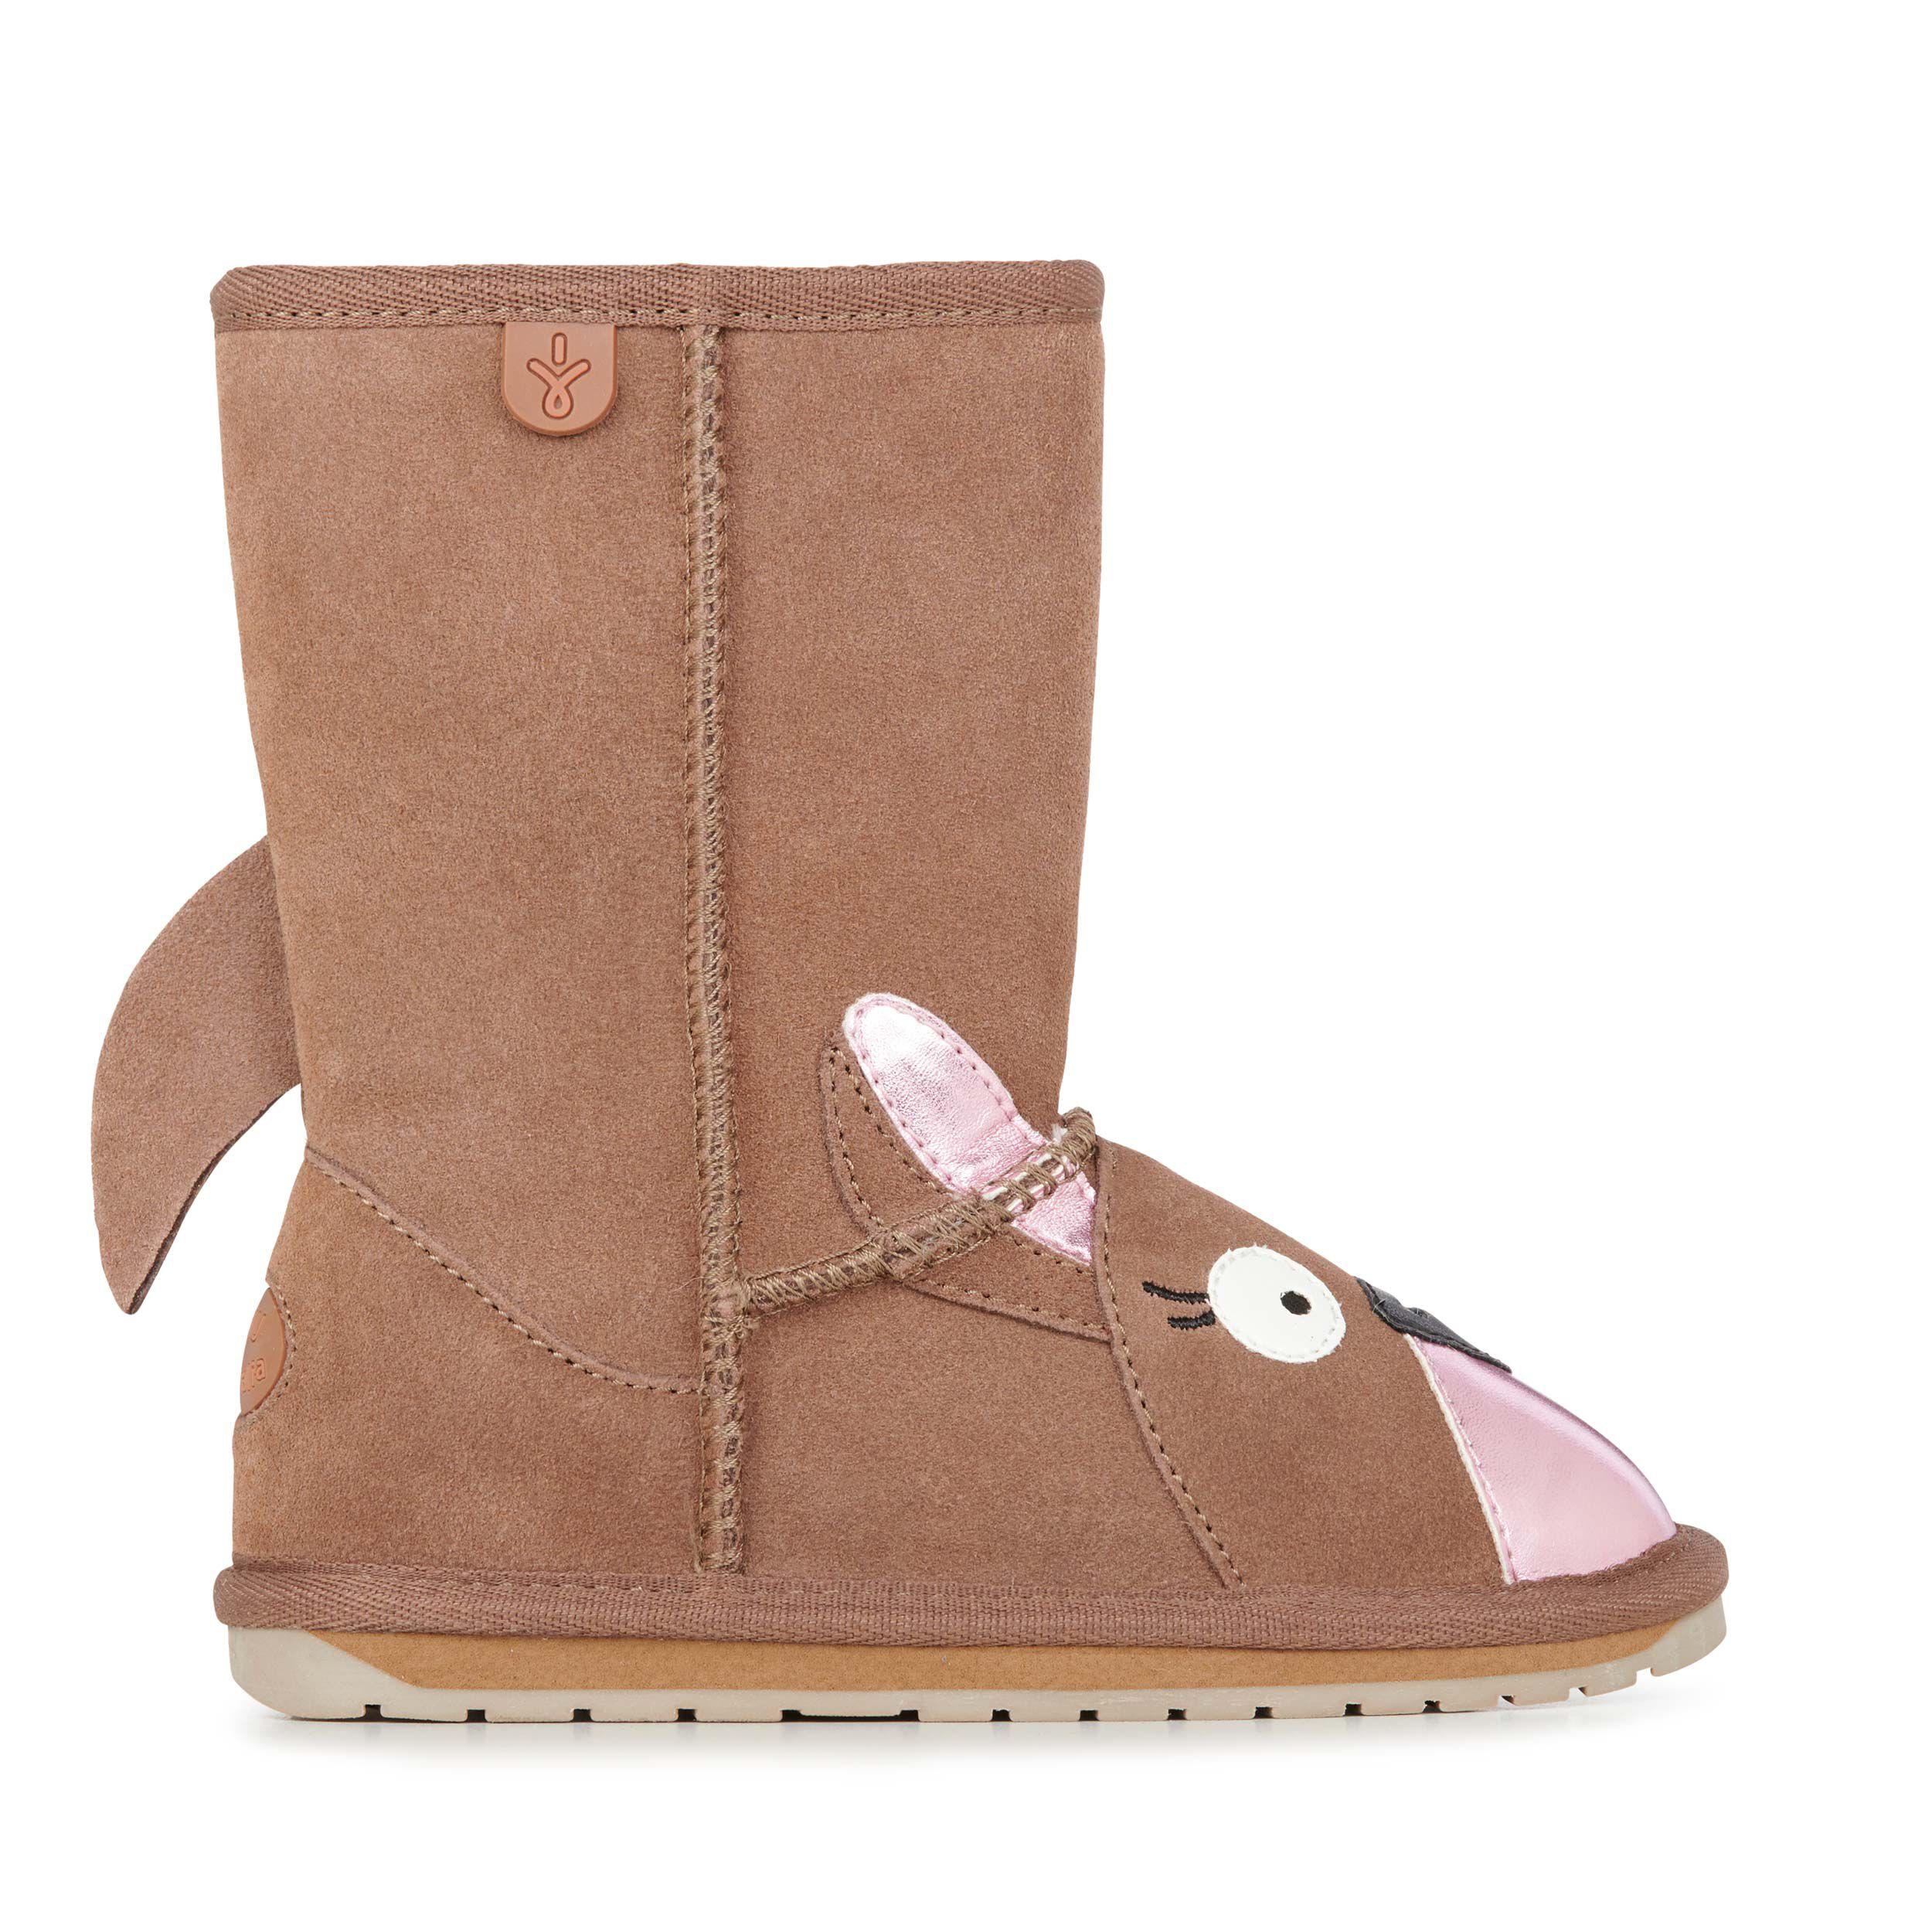 Sheepskin sheepskin: reviews. Homemade Warm Shoes